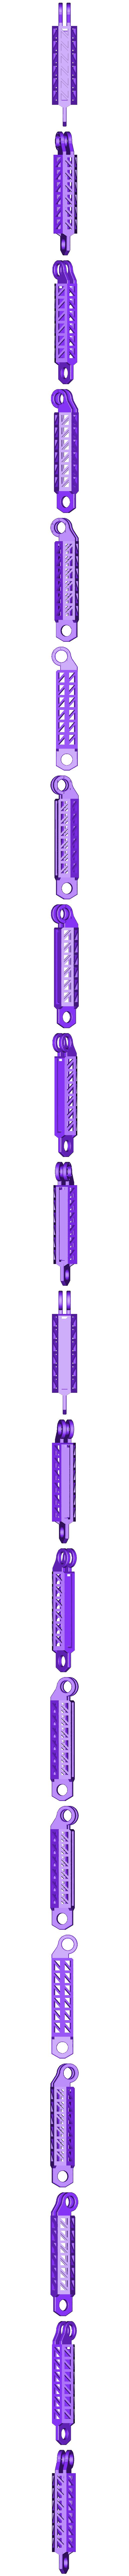 hexaspot_arm_bottom_no_nut.stl Download free STL file HexaSpot Lamp v1 • 3D printing object, marigu